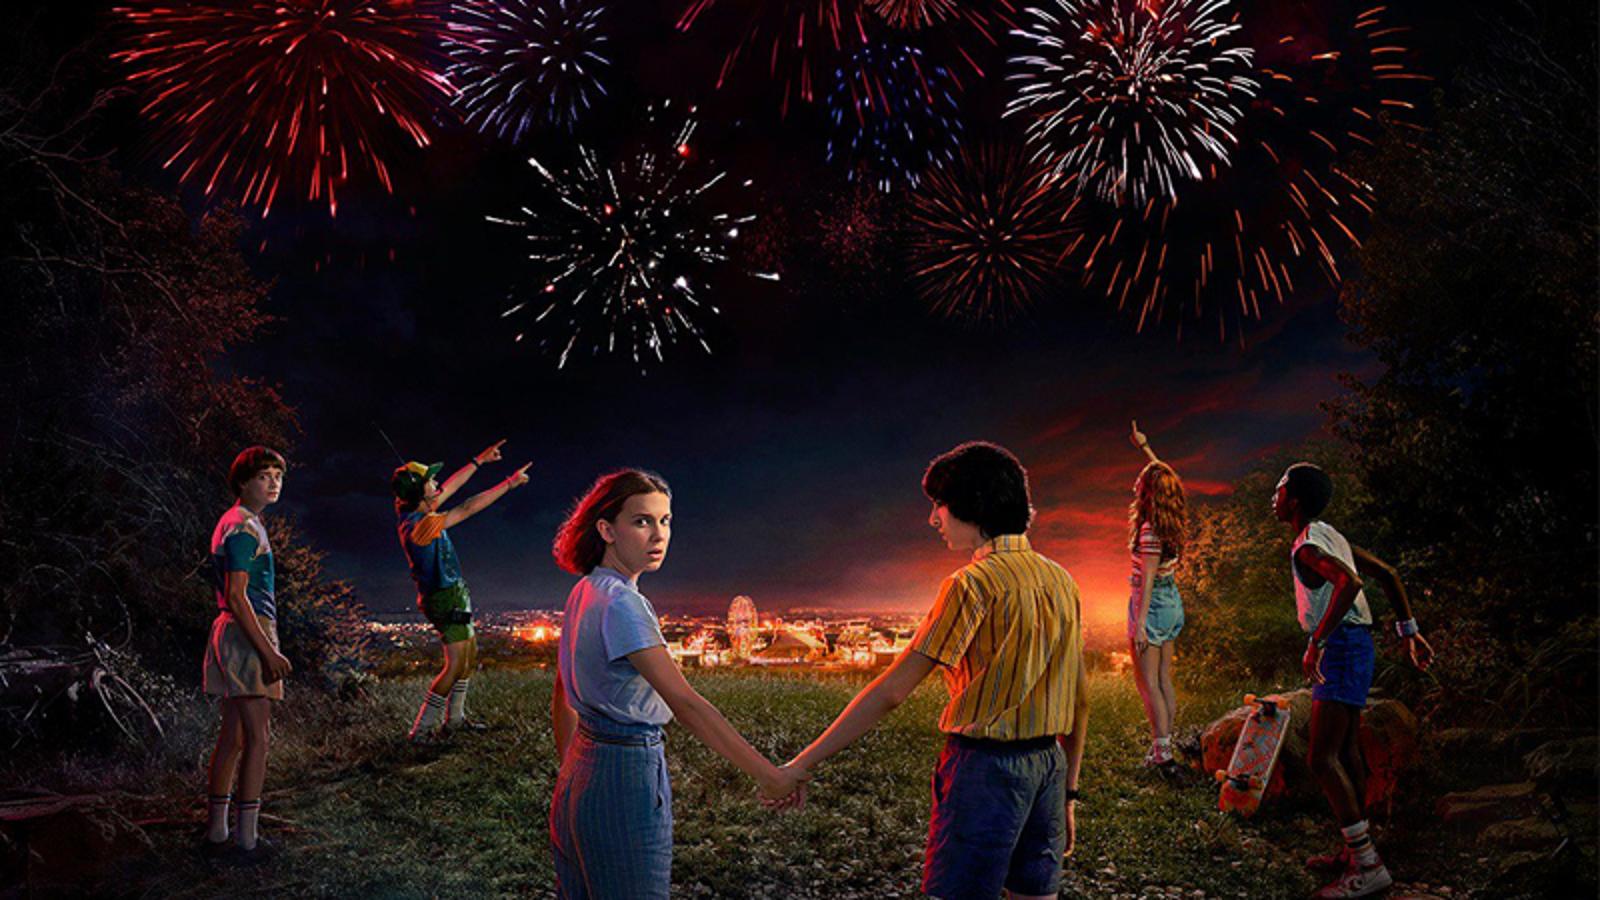 01c451db93a Stranger Things Season 3 Releases July 4, 2019